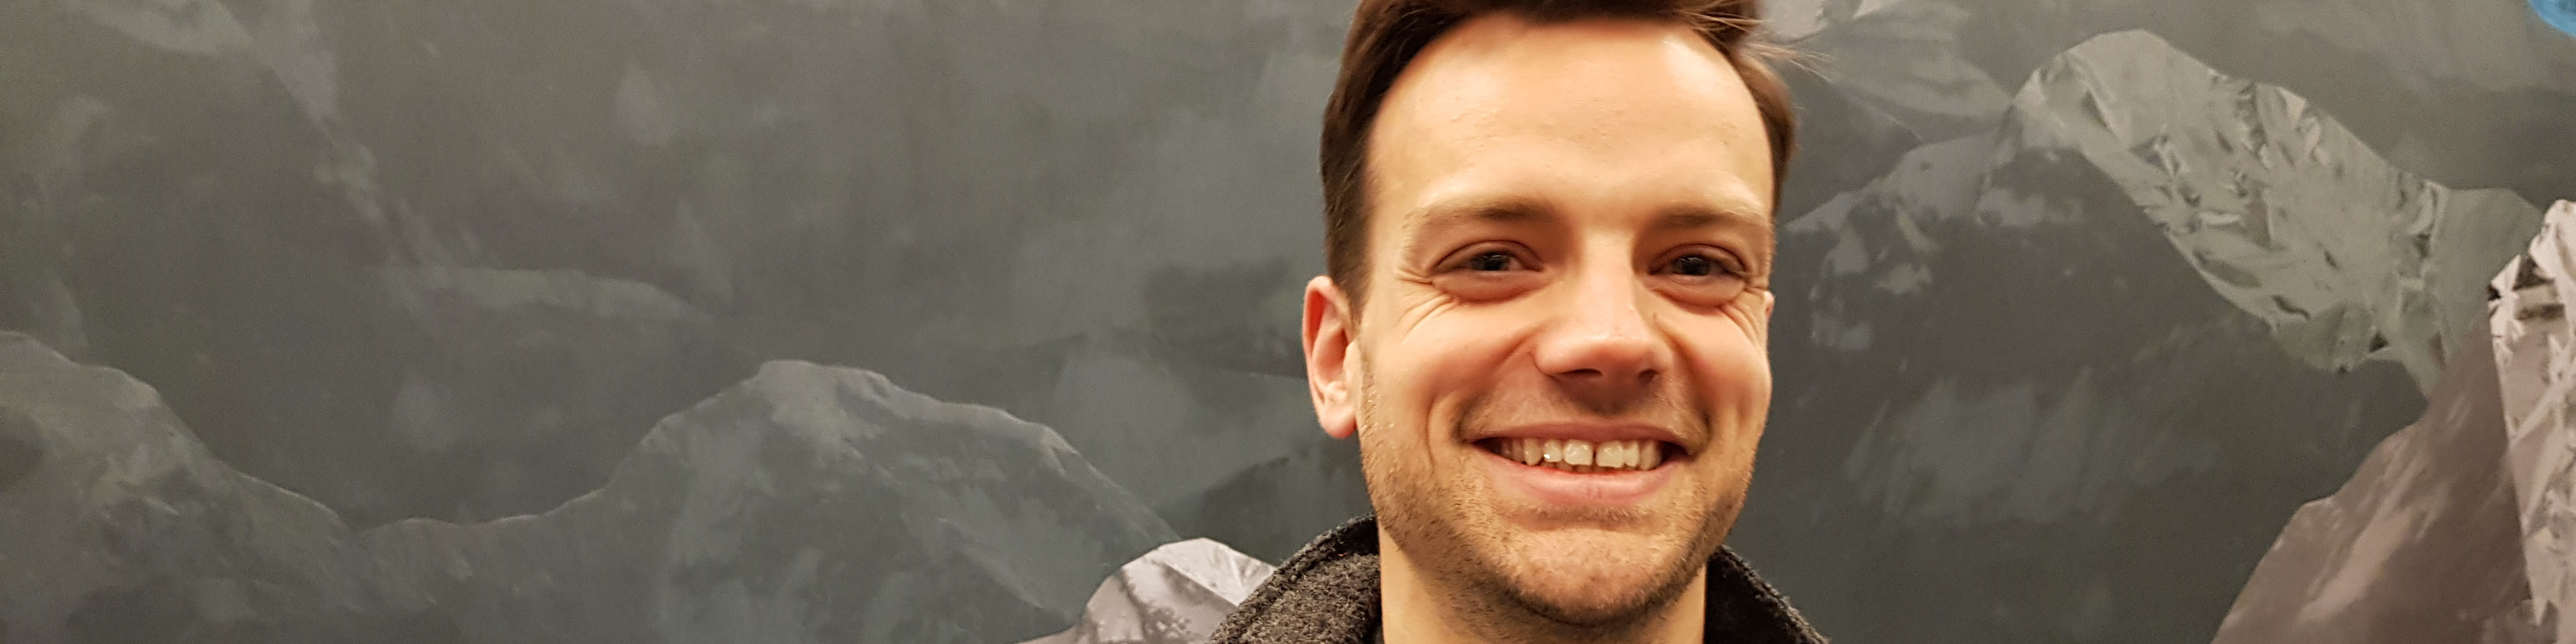 Koch Patrick Wodni